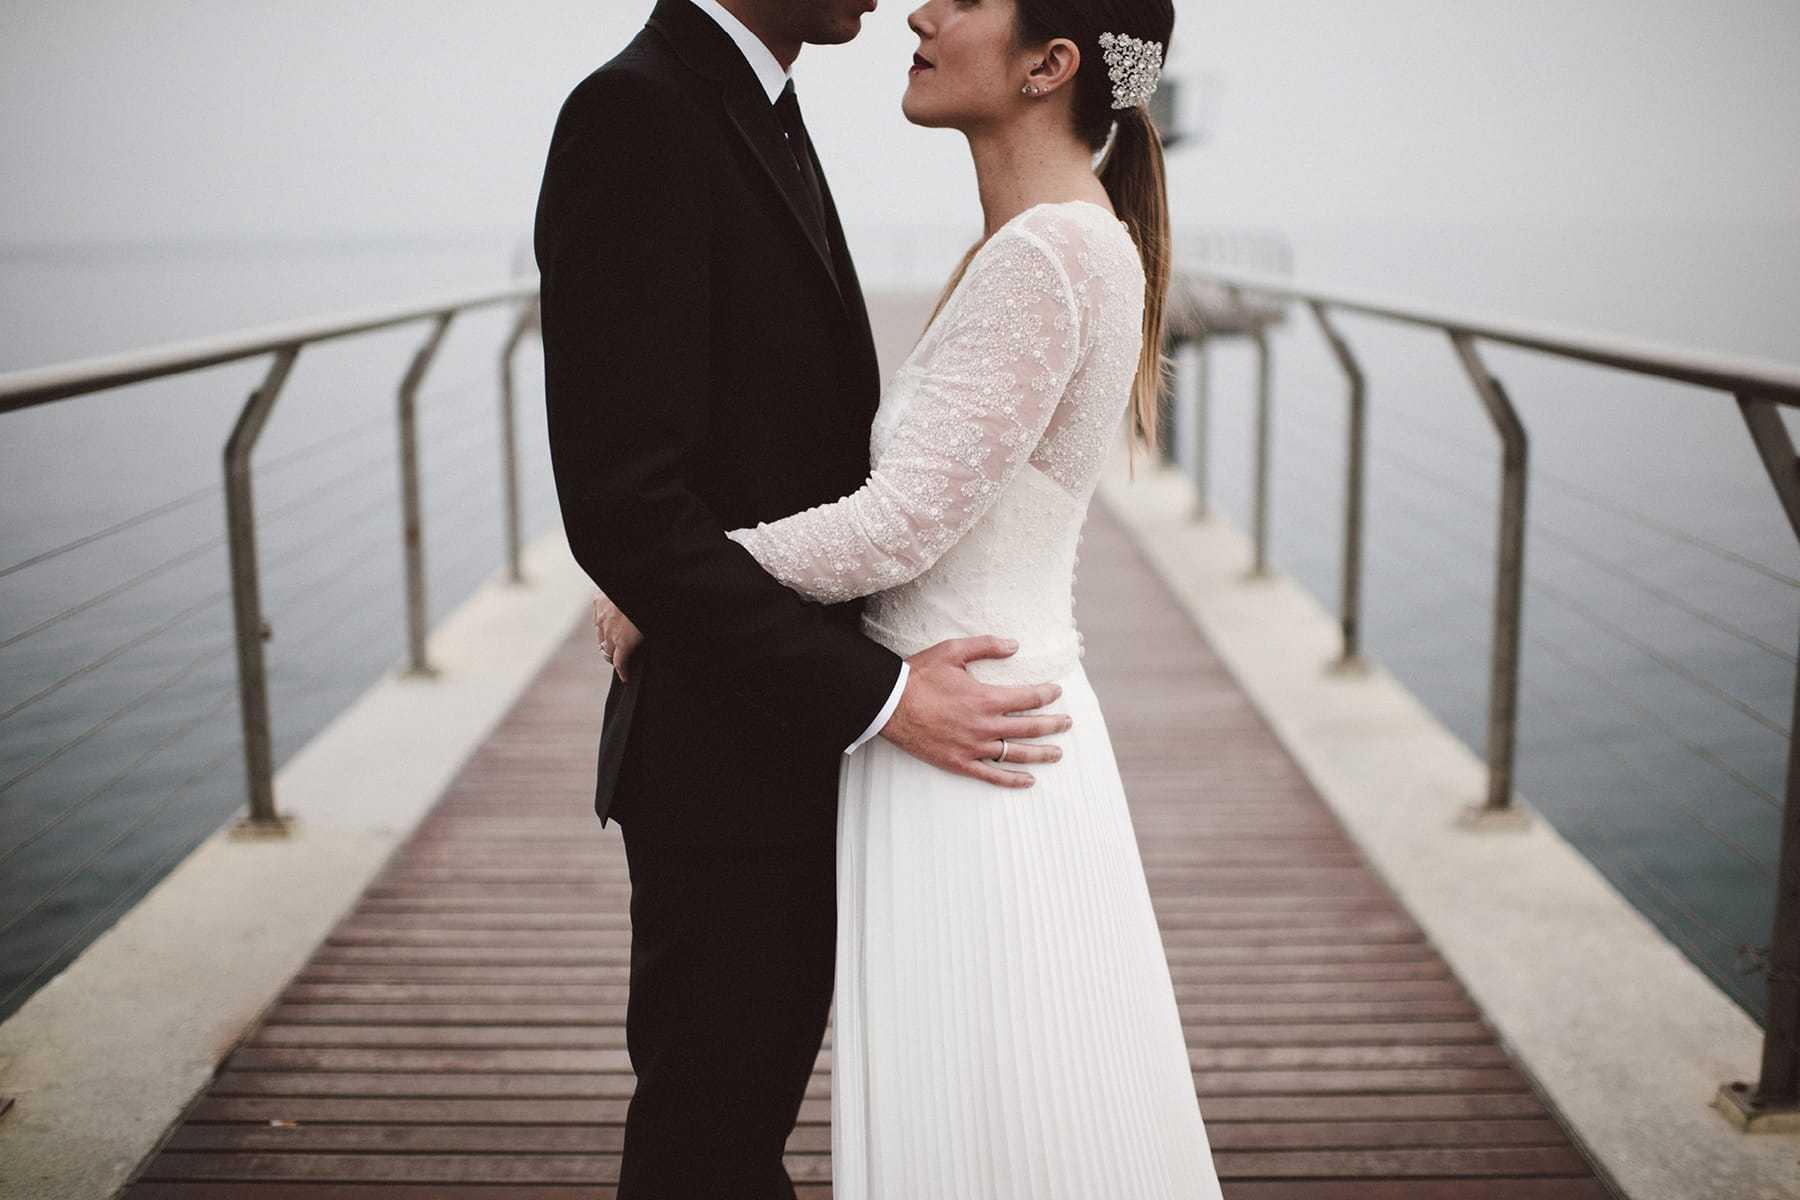 vestido_de_novia_otaduy_hilario_sanchez_fotografo_boda_barcelona_090